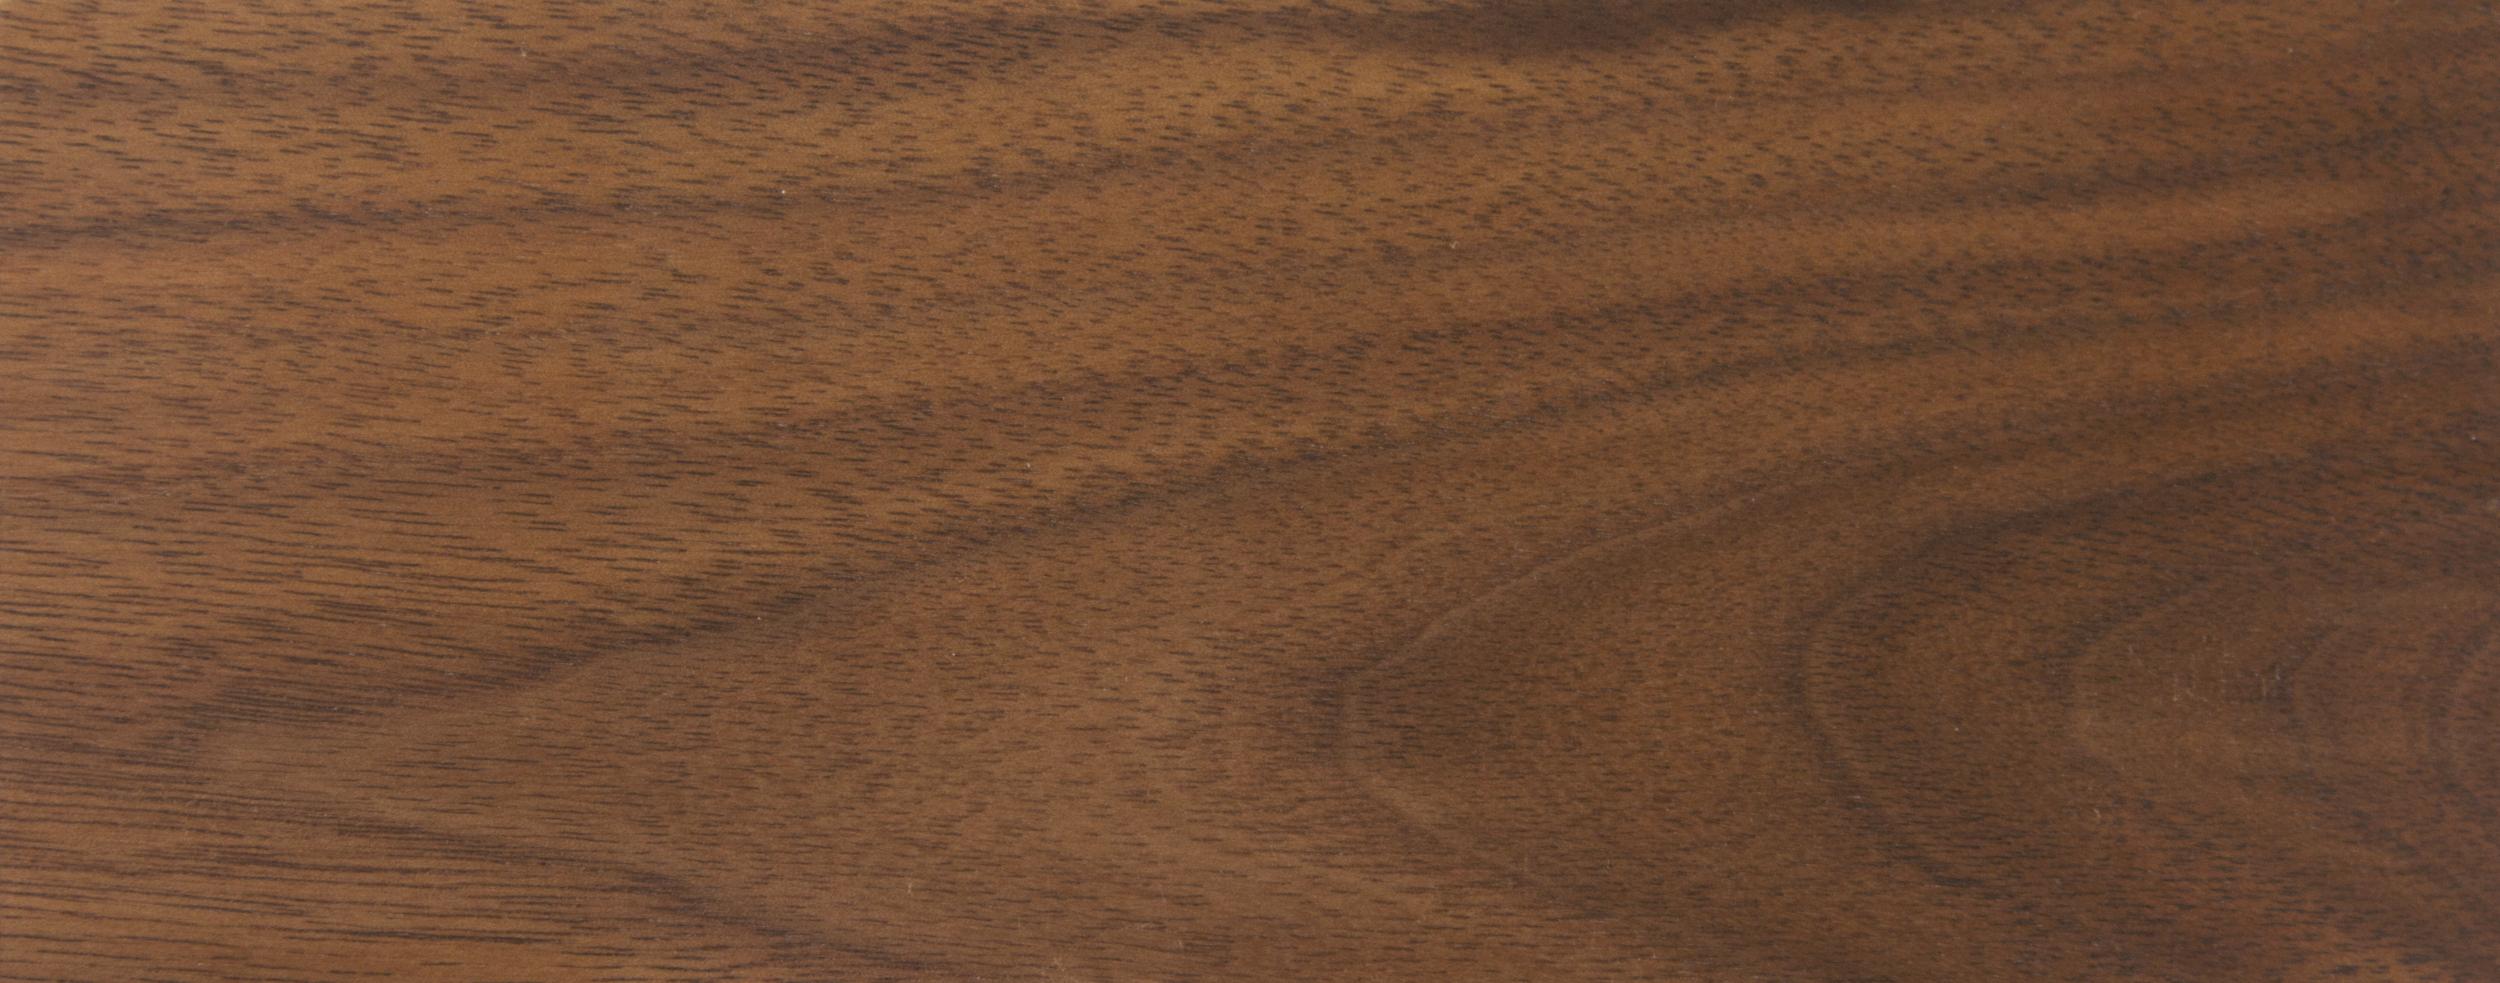 walnut - oiled